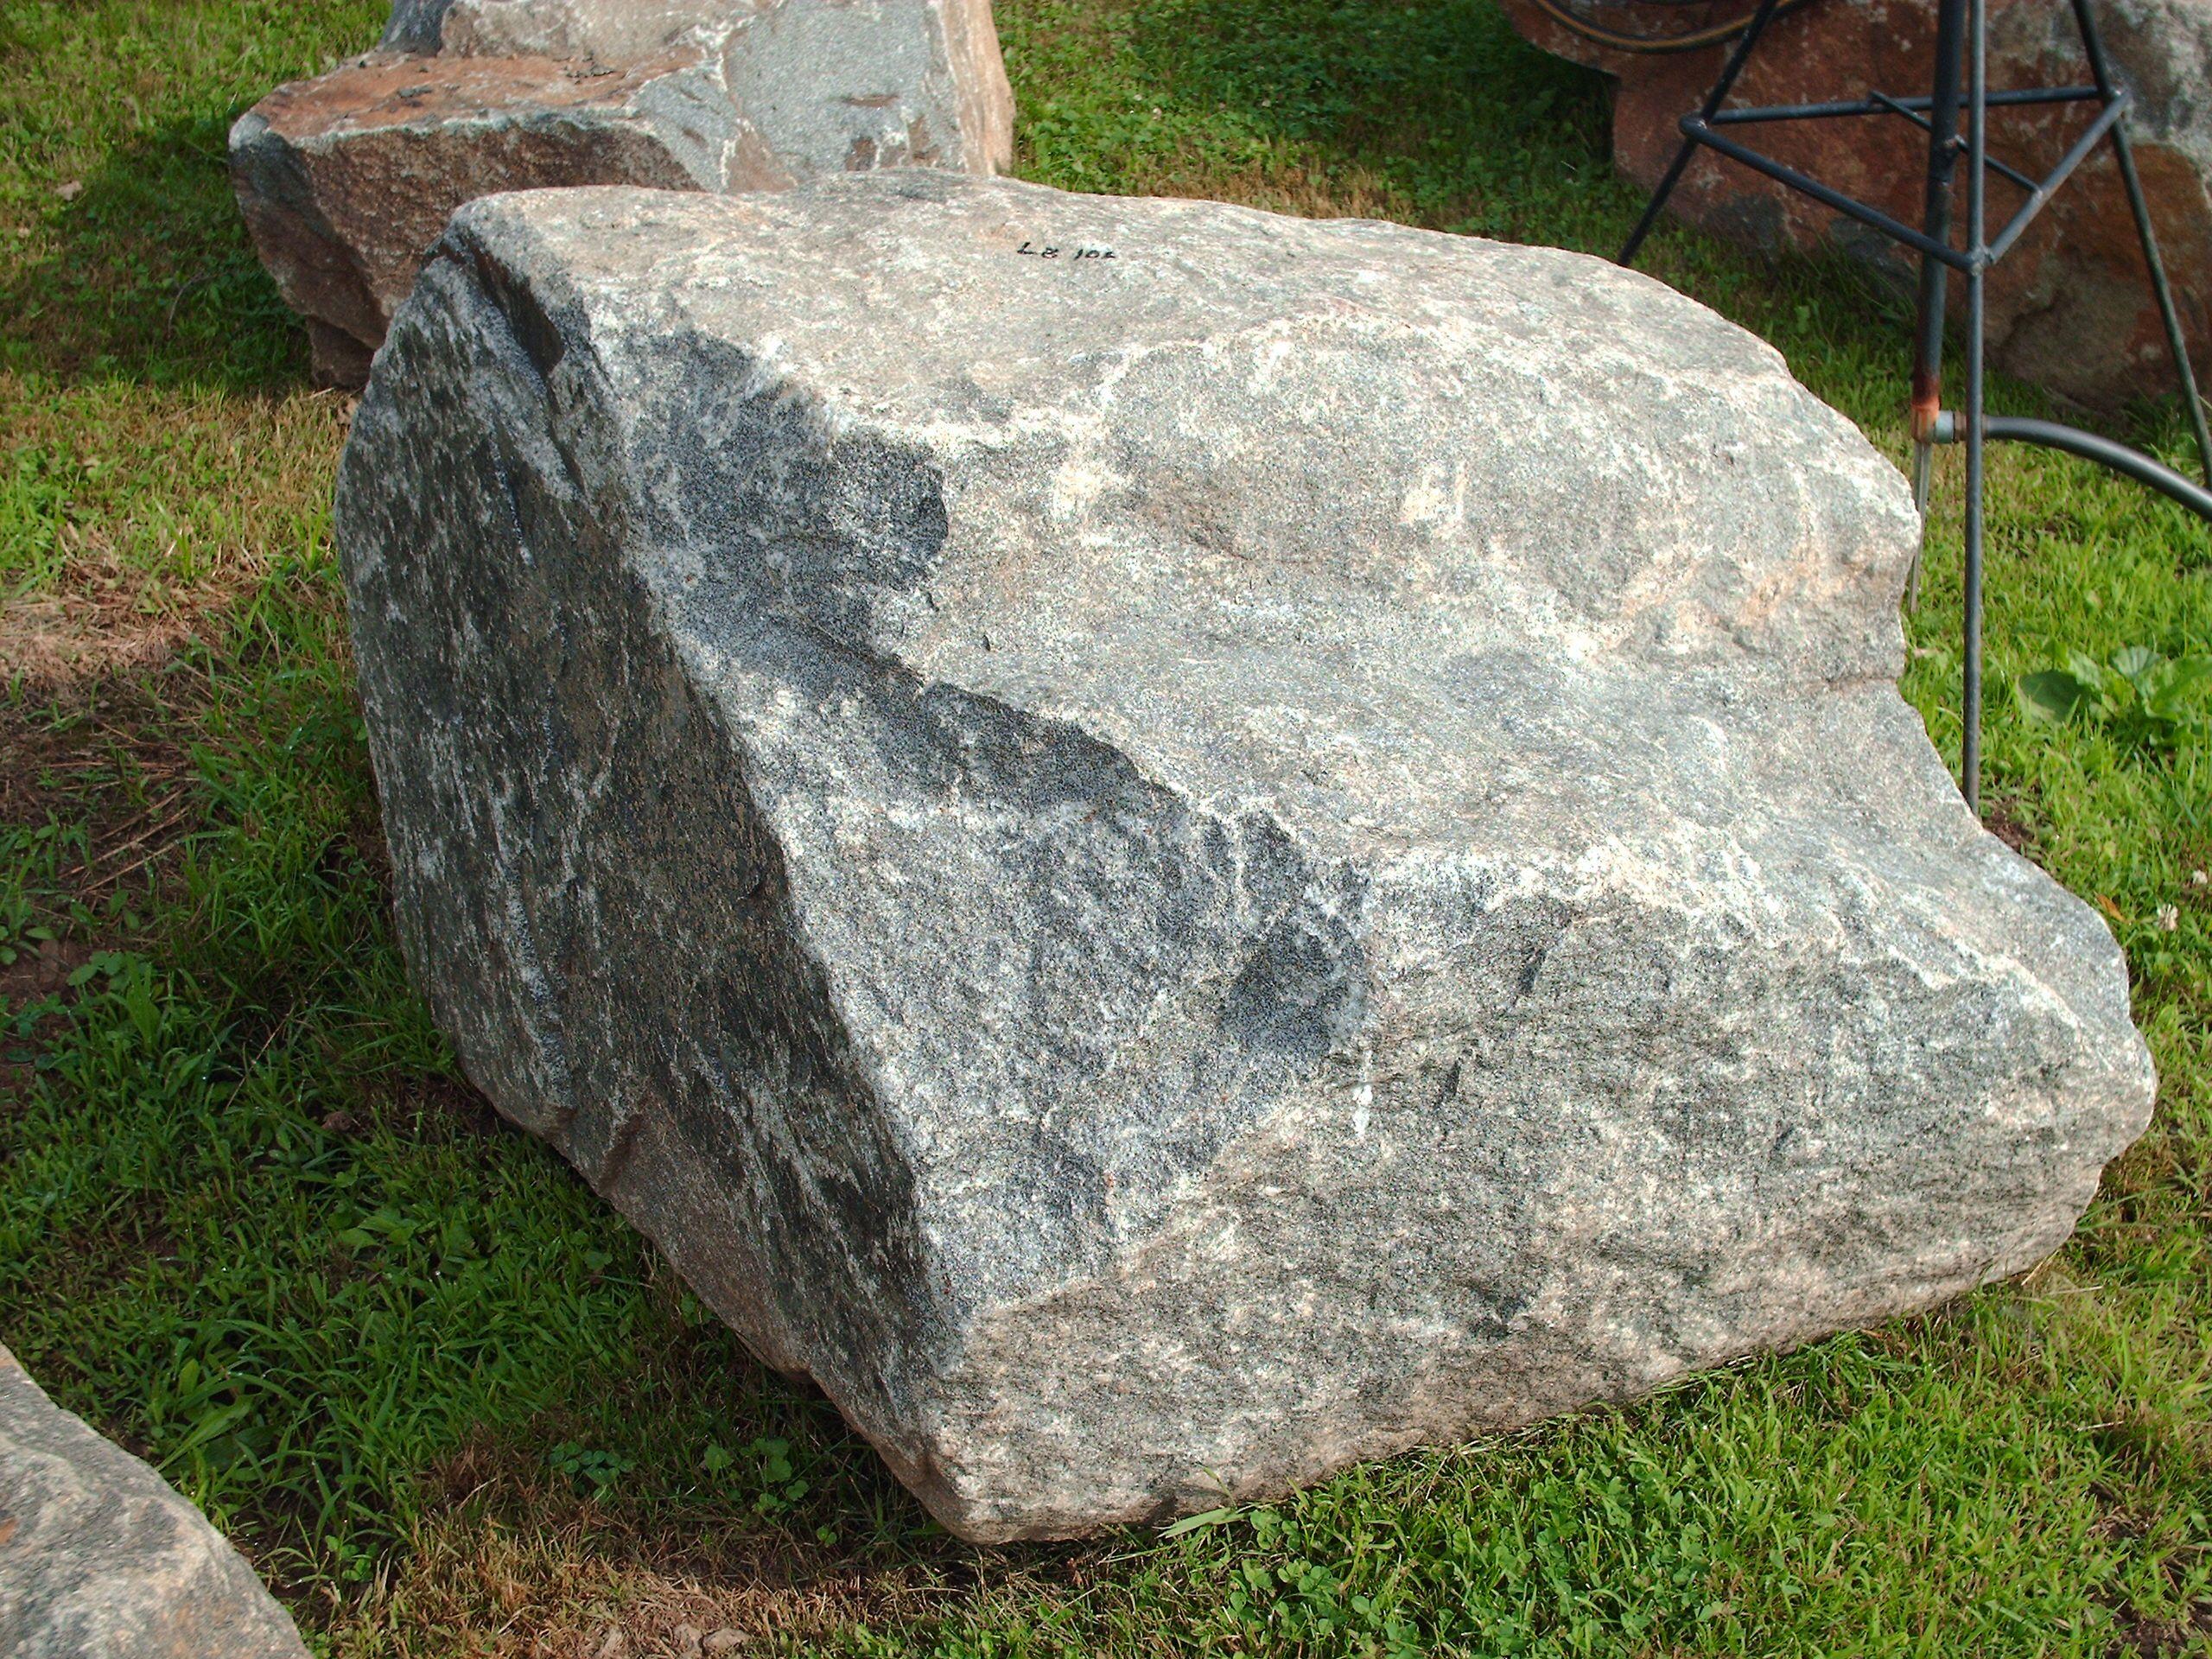 delightful rocks and boulders